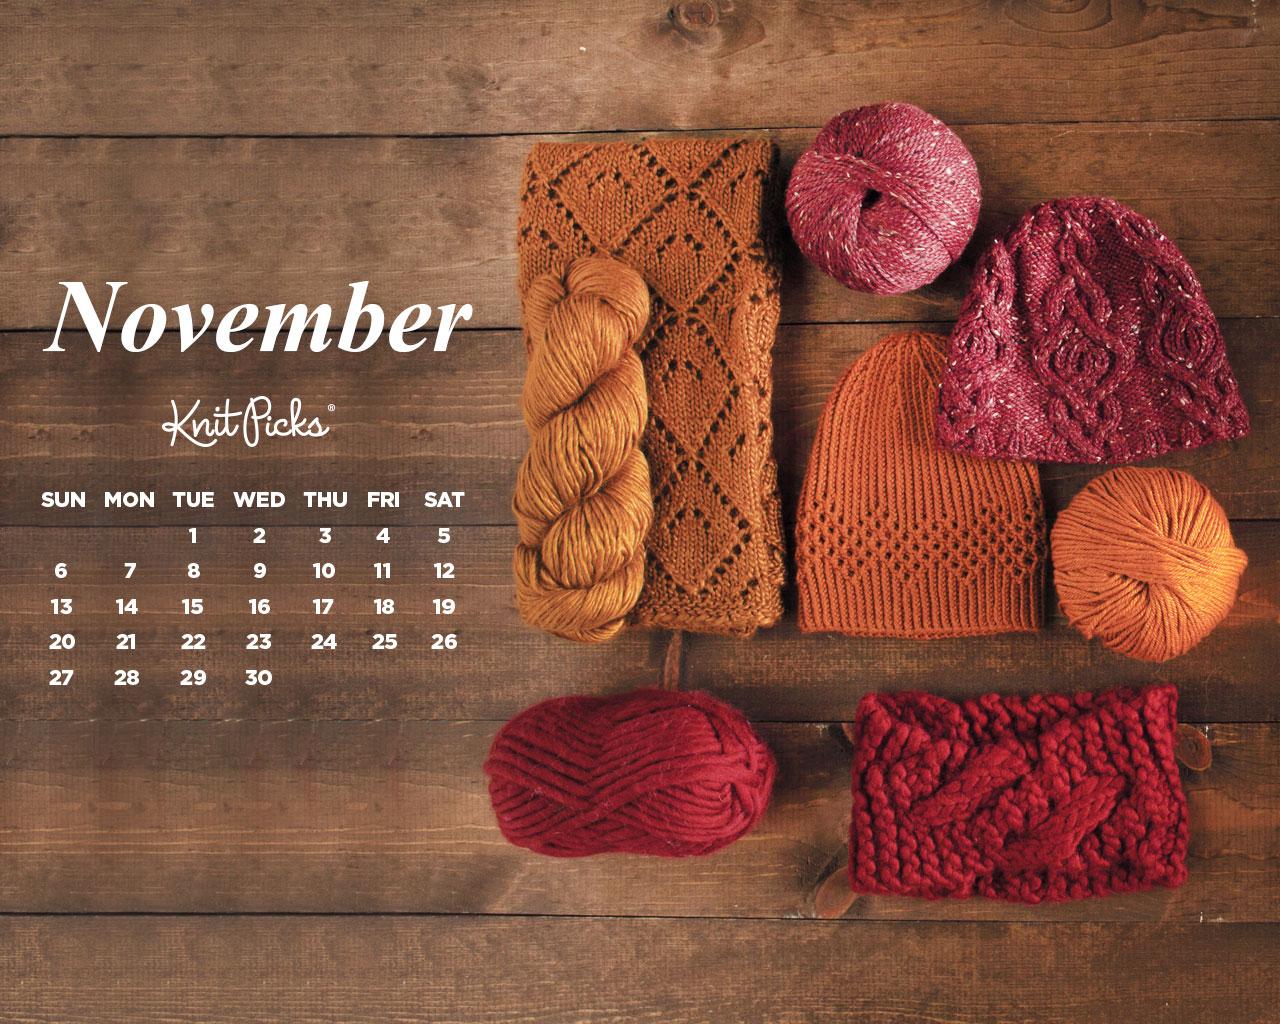 Christian Wallpaper Fall Free Downloadable Calendar For November 2016 From